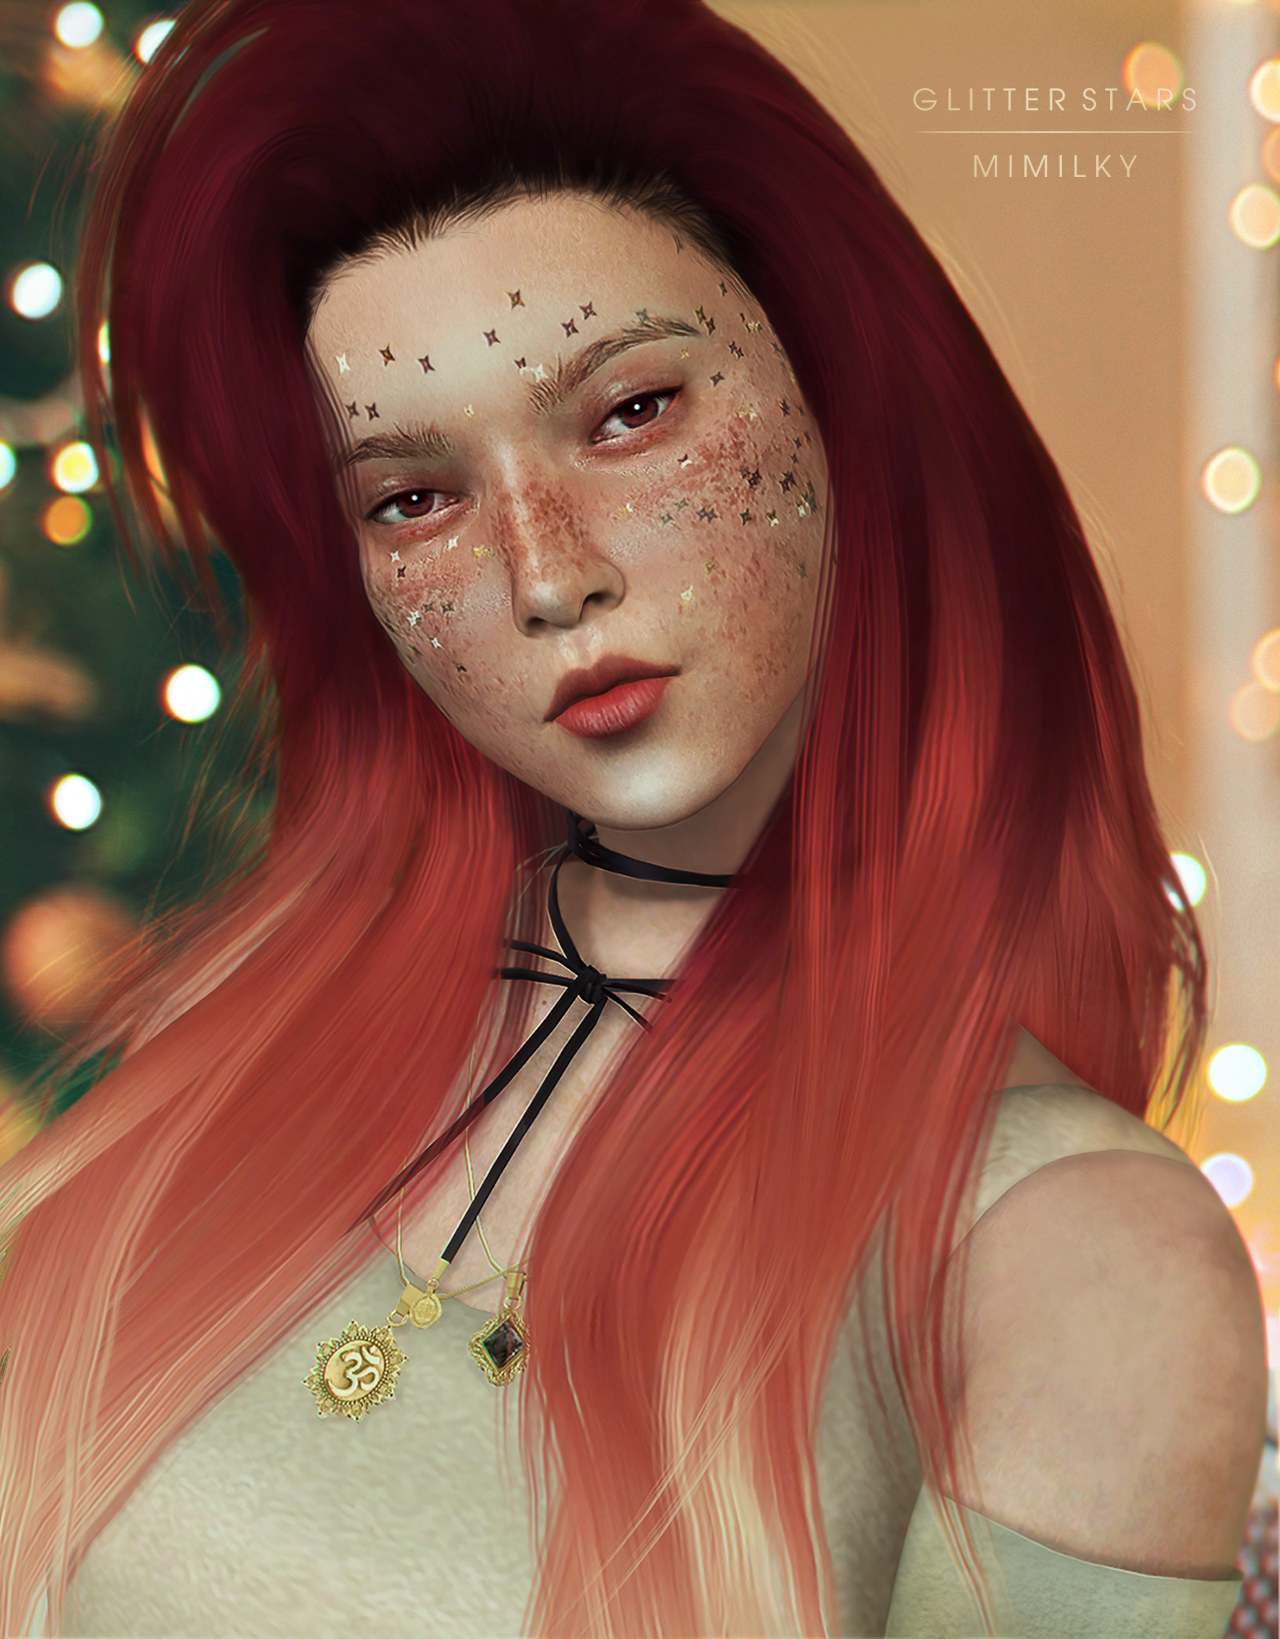 Глиттер - Glitter Stars